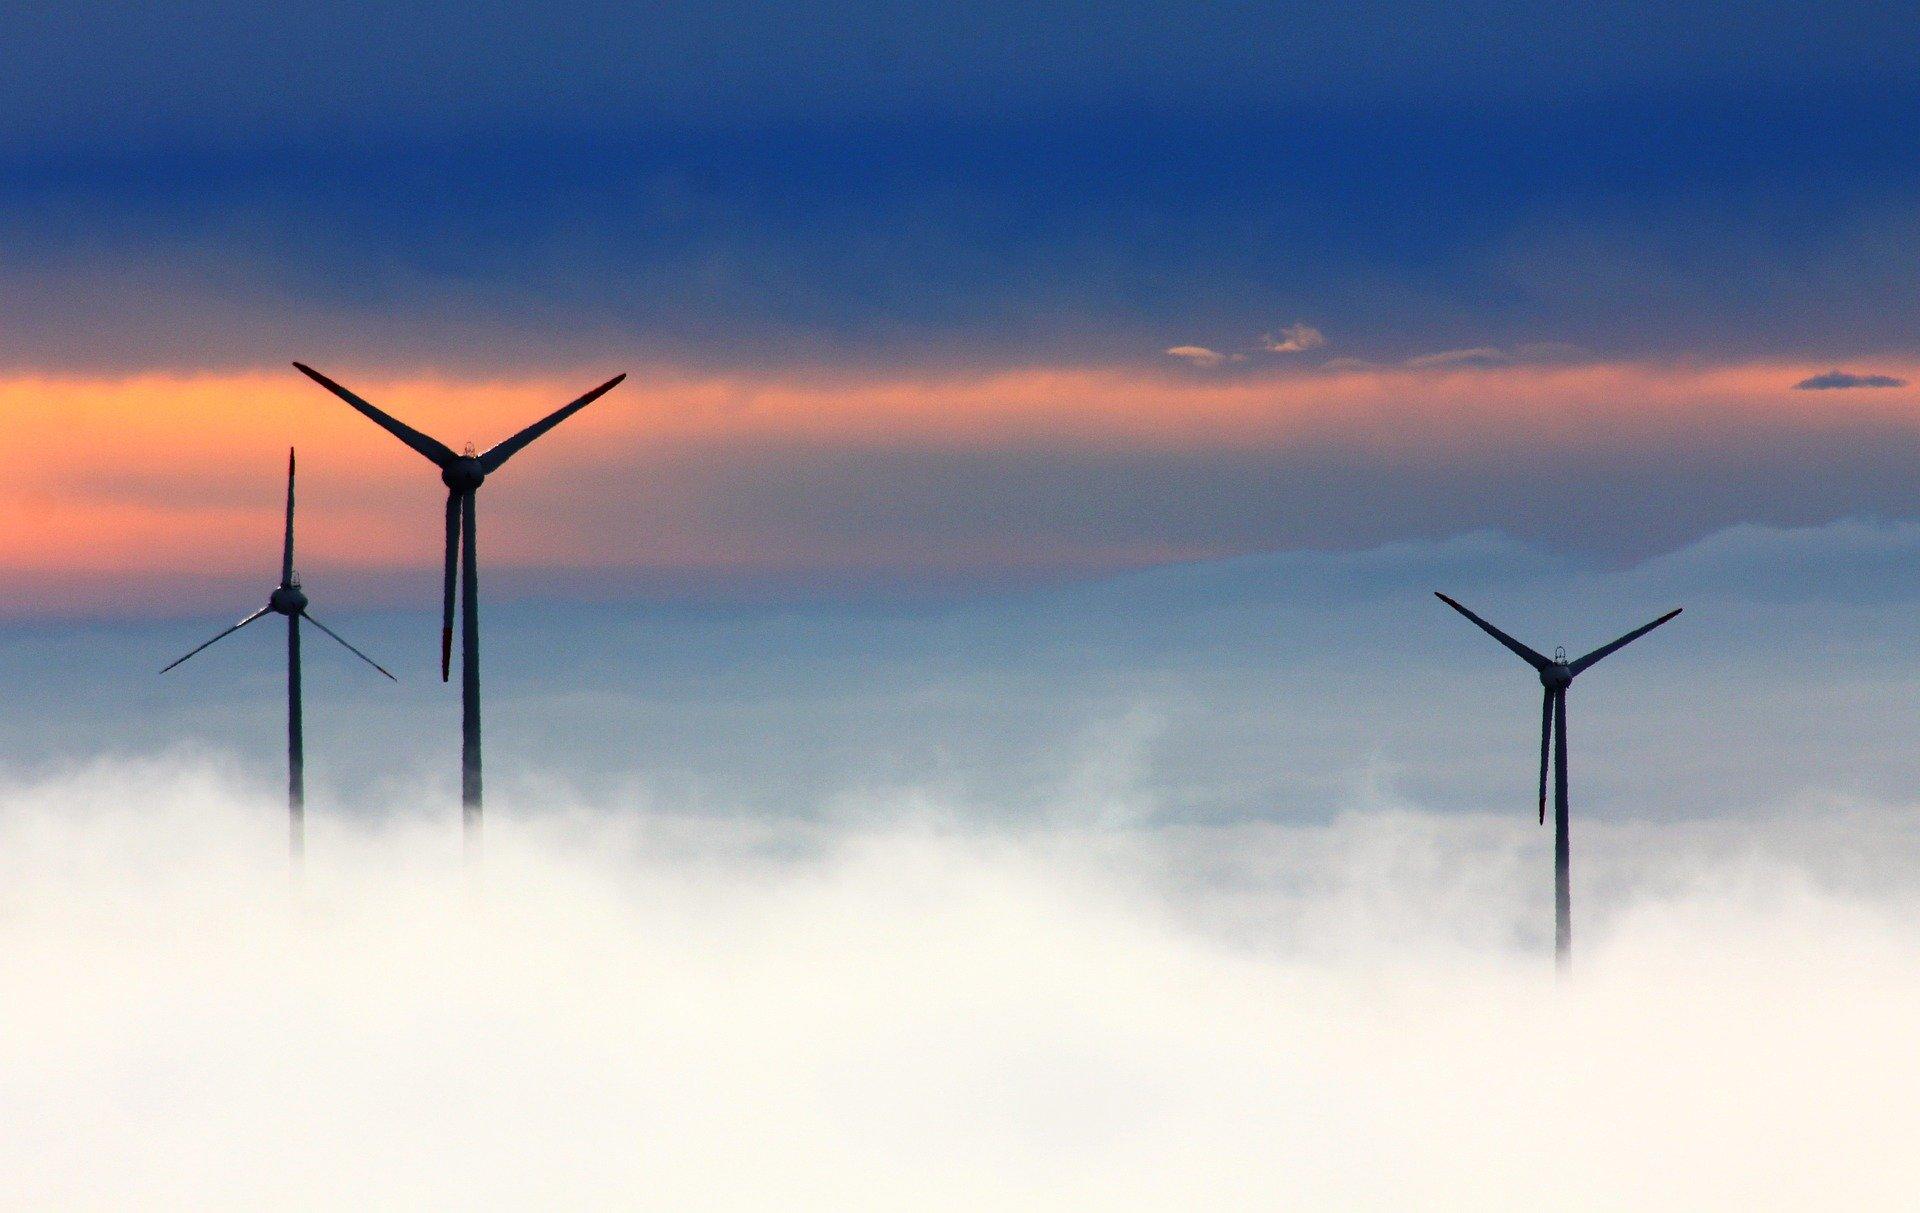 Ekoenergetyka PV – konsekwentna strategia rozwoju